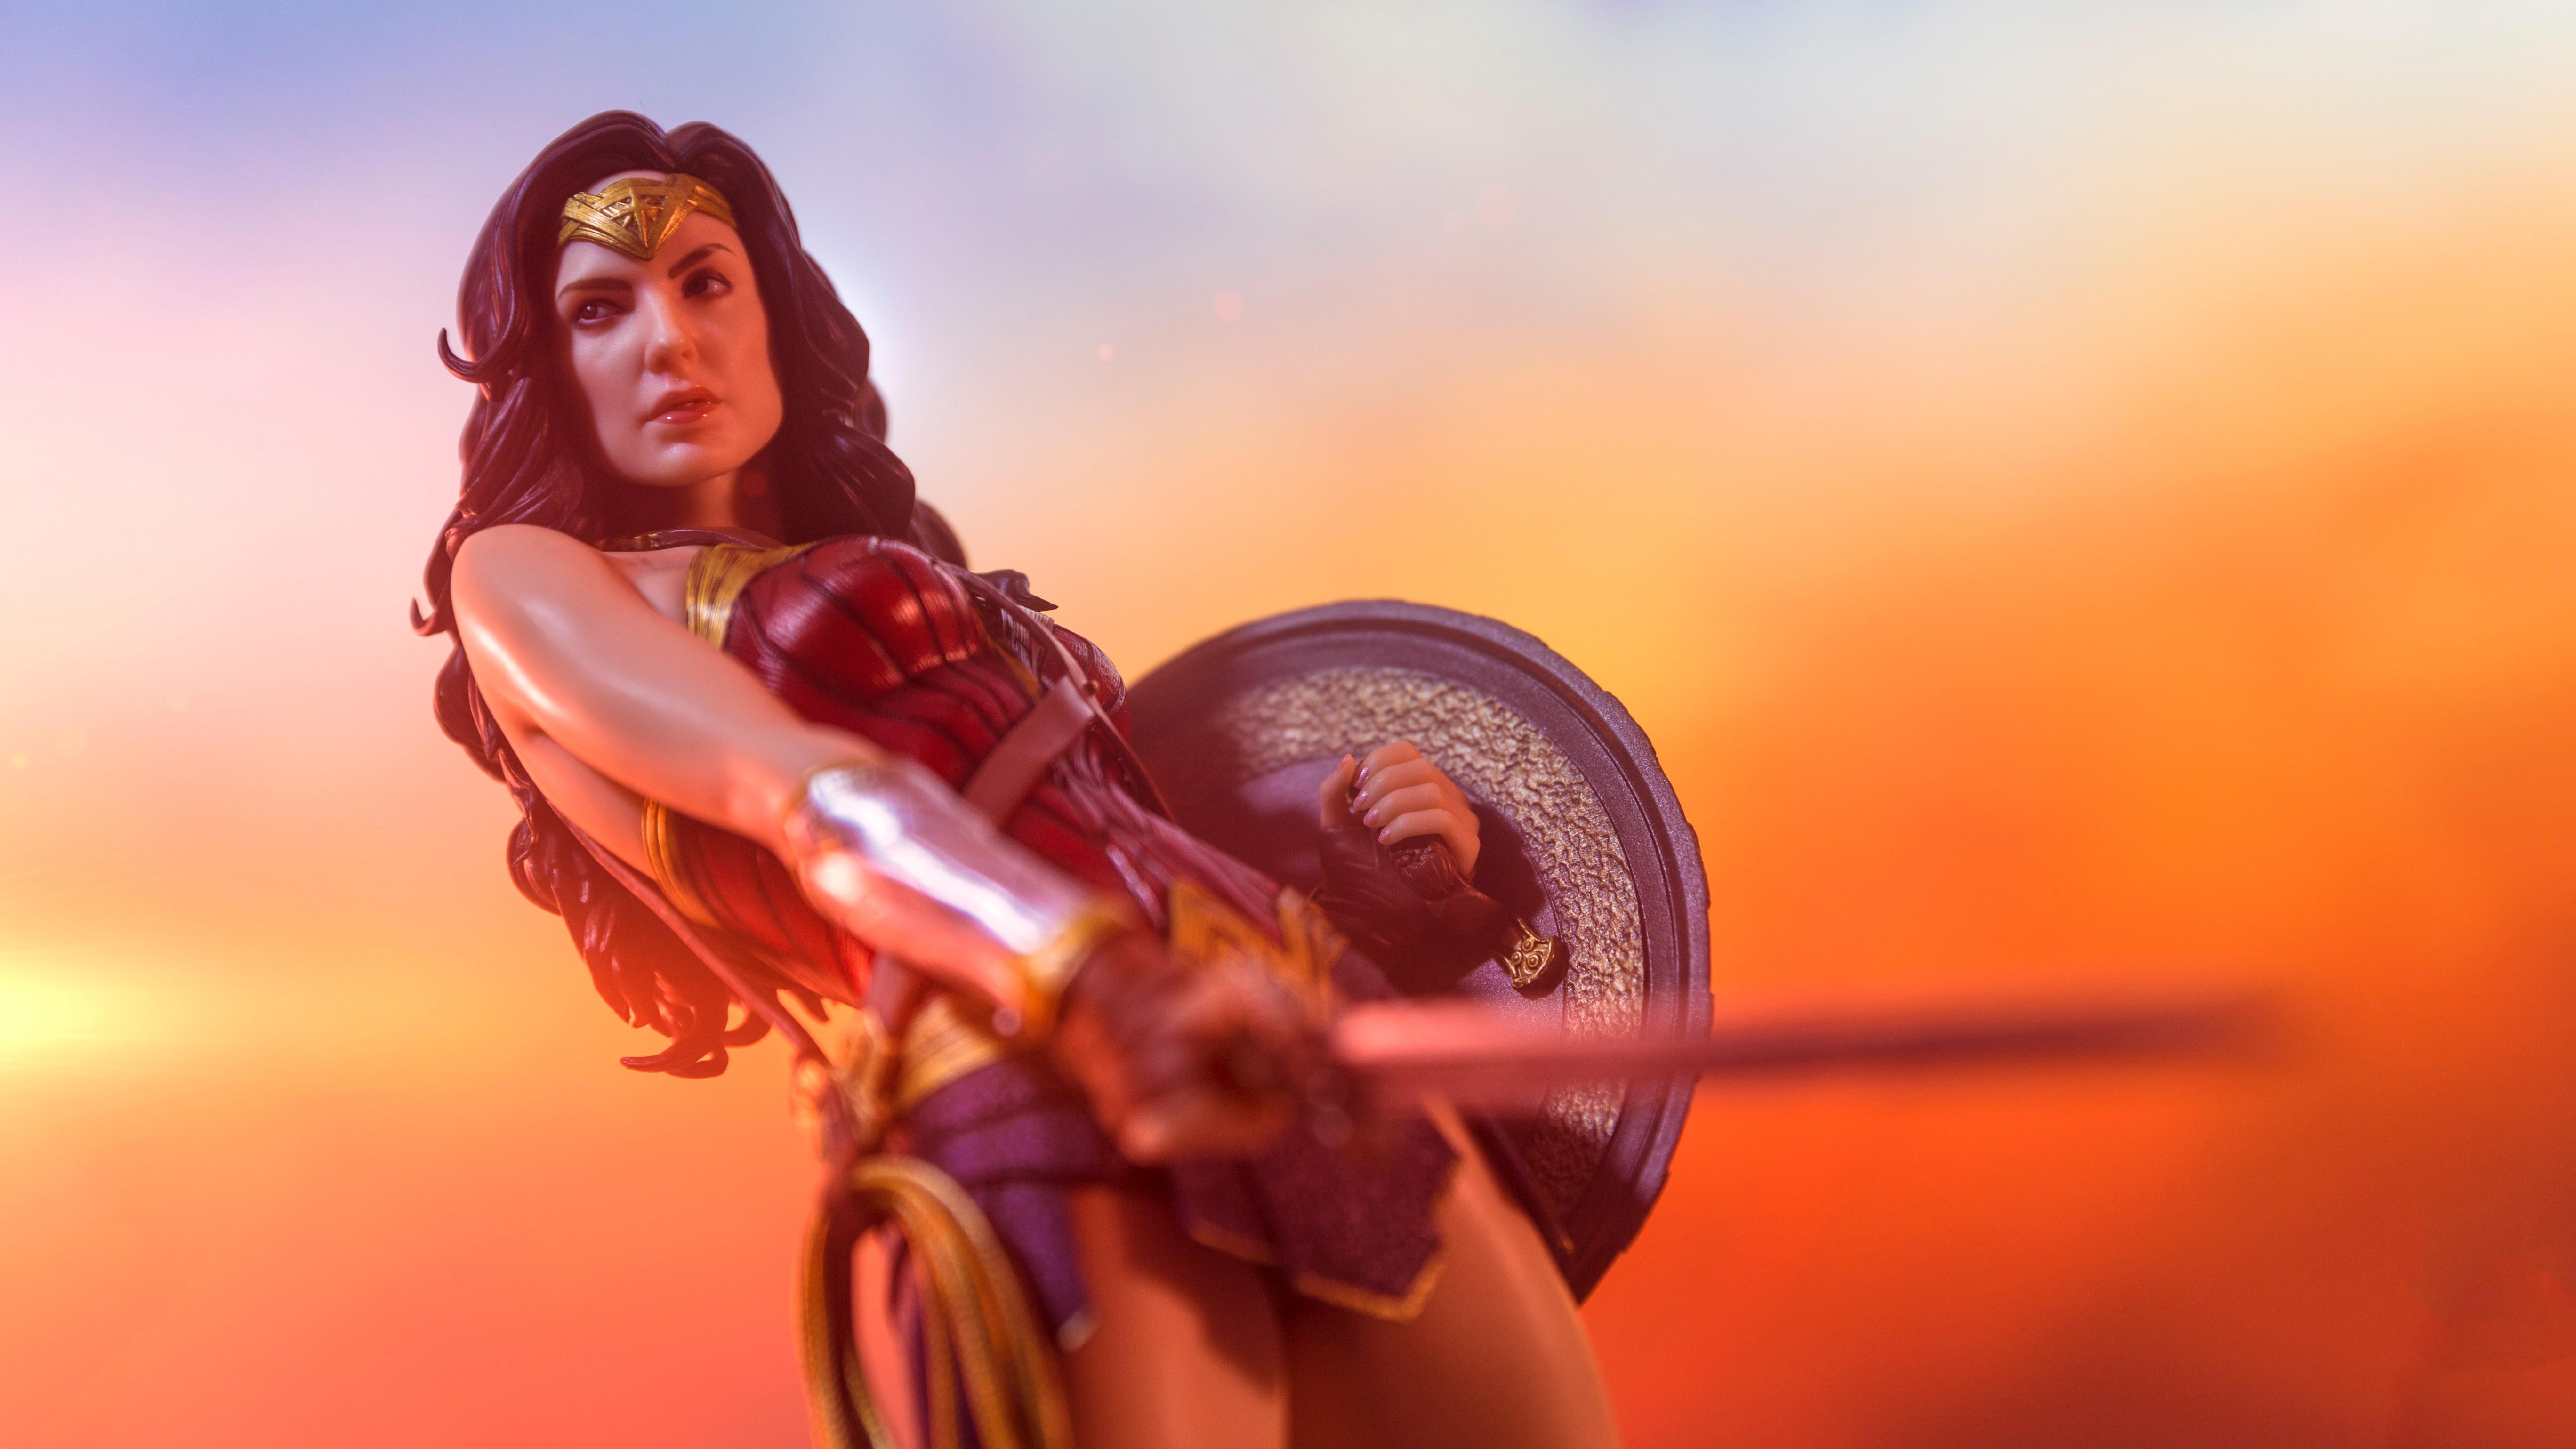 Wonder Woman 5k Collectible Photography, HD Superheroes